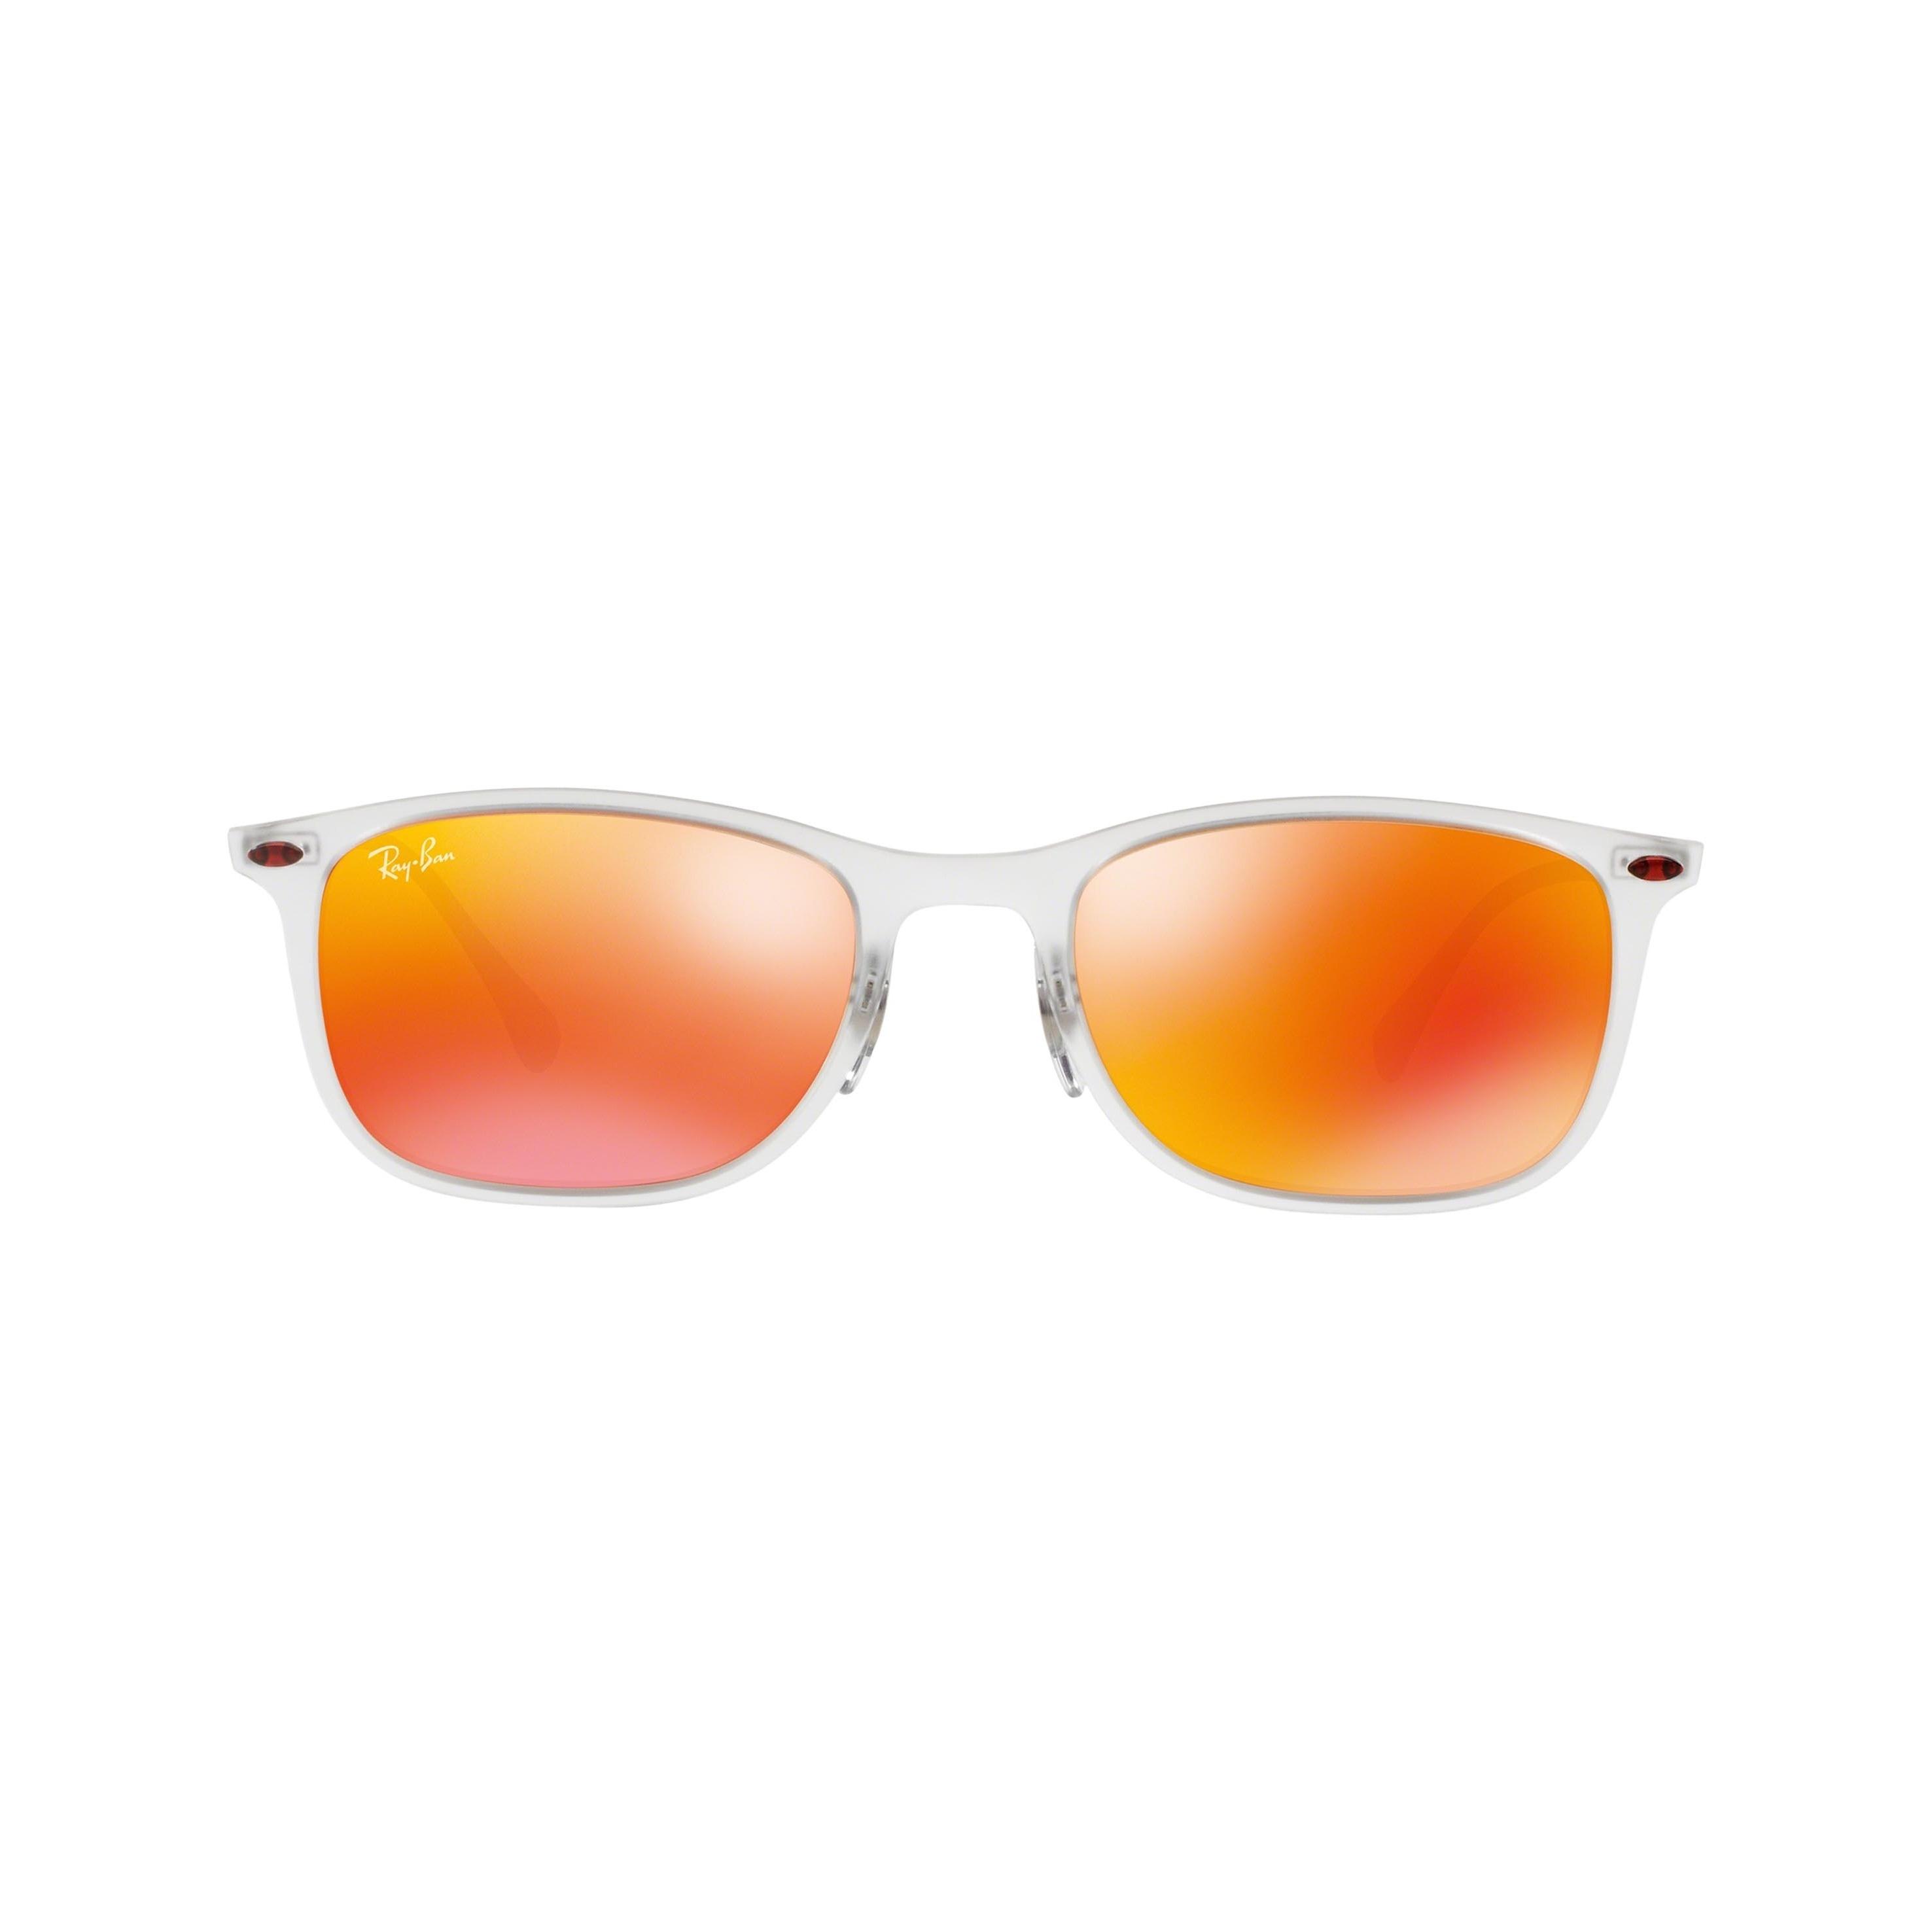 b7910dce3e6e3 Shop Ray-Ban New Wayfarer Light Ray RB4225 646 6Q Unisex Transparent Gunmetal  Frame Red Mirror Lenses Sunglasses - Free Shipping Today - Overstock - ...